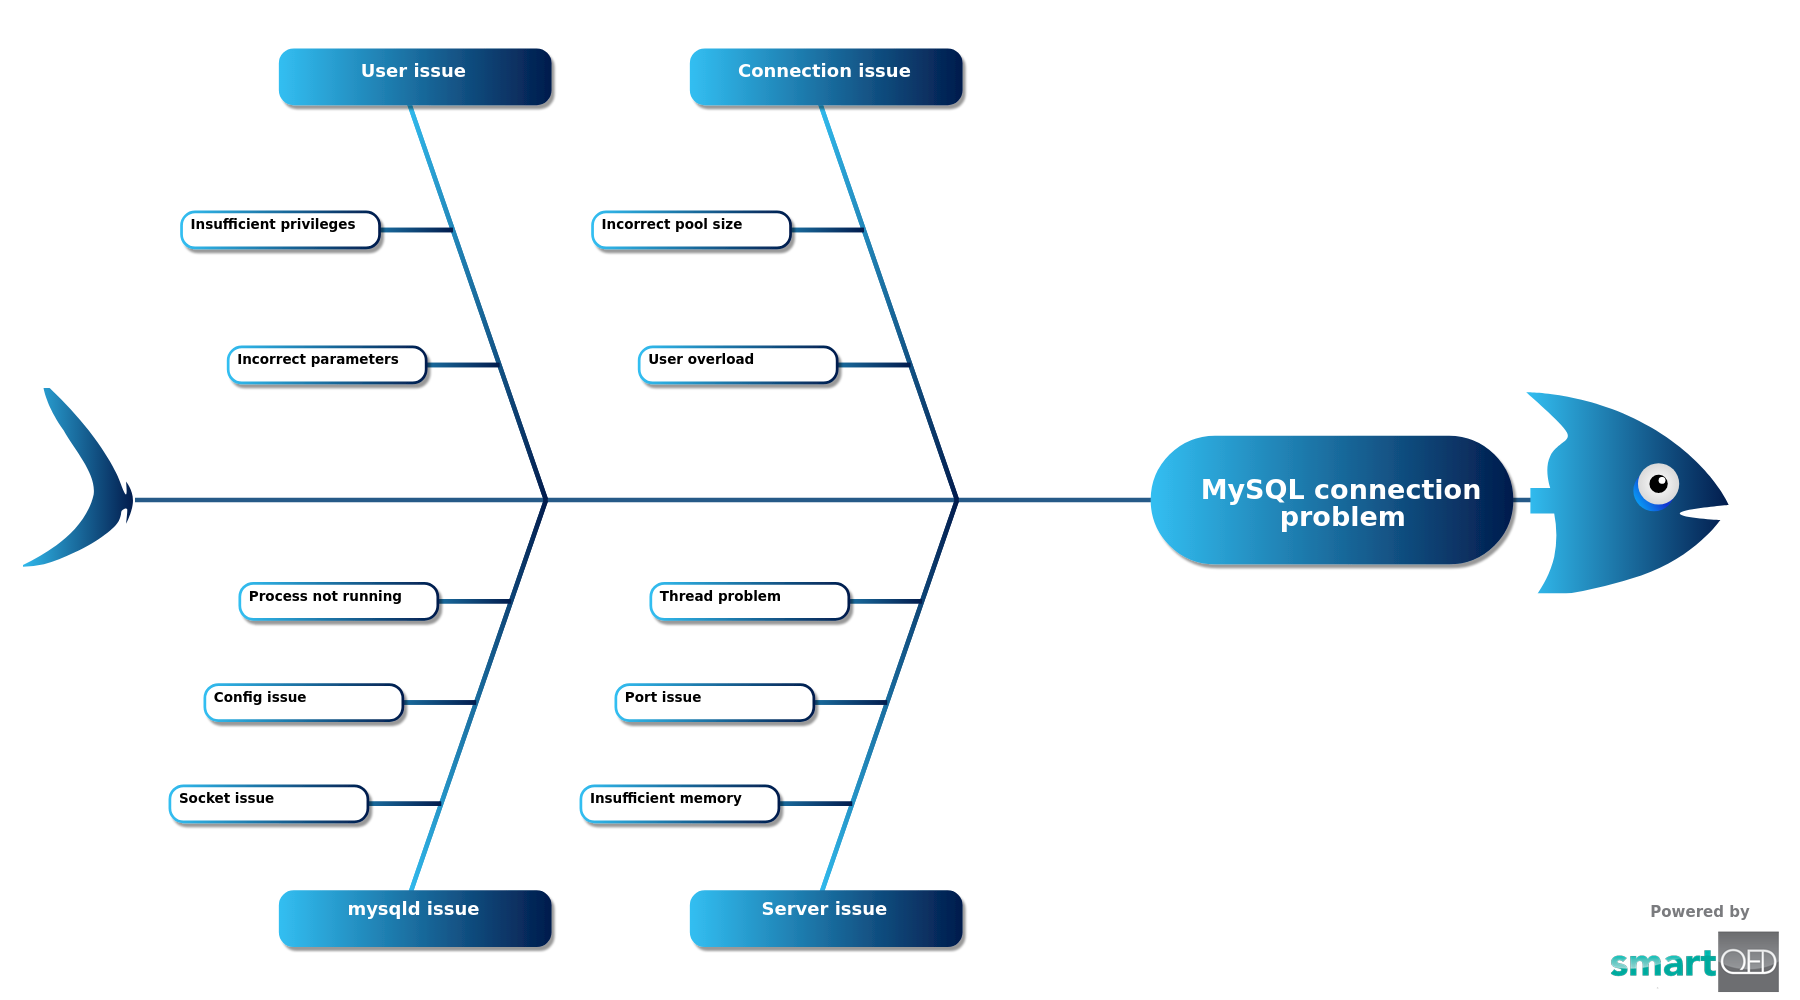 MySQL Connection Problem